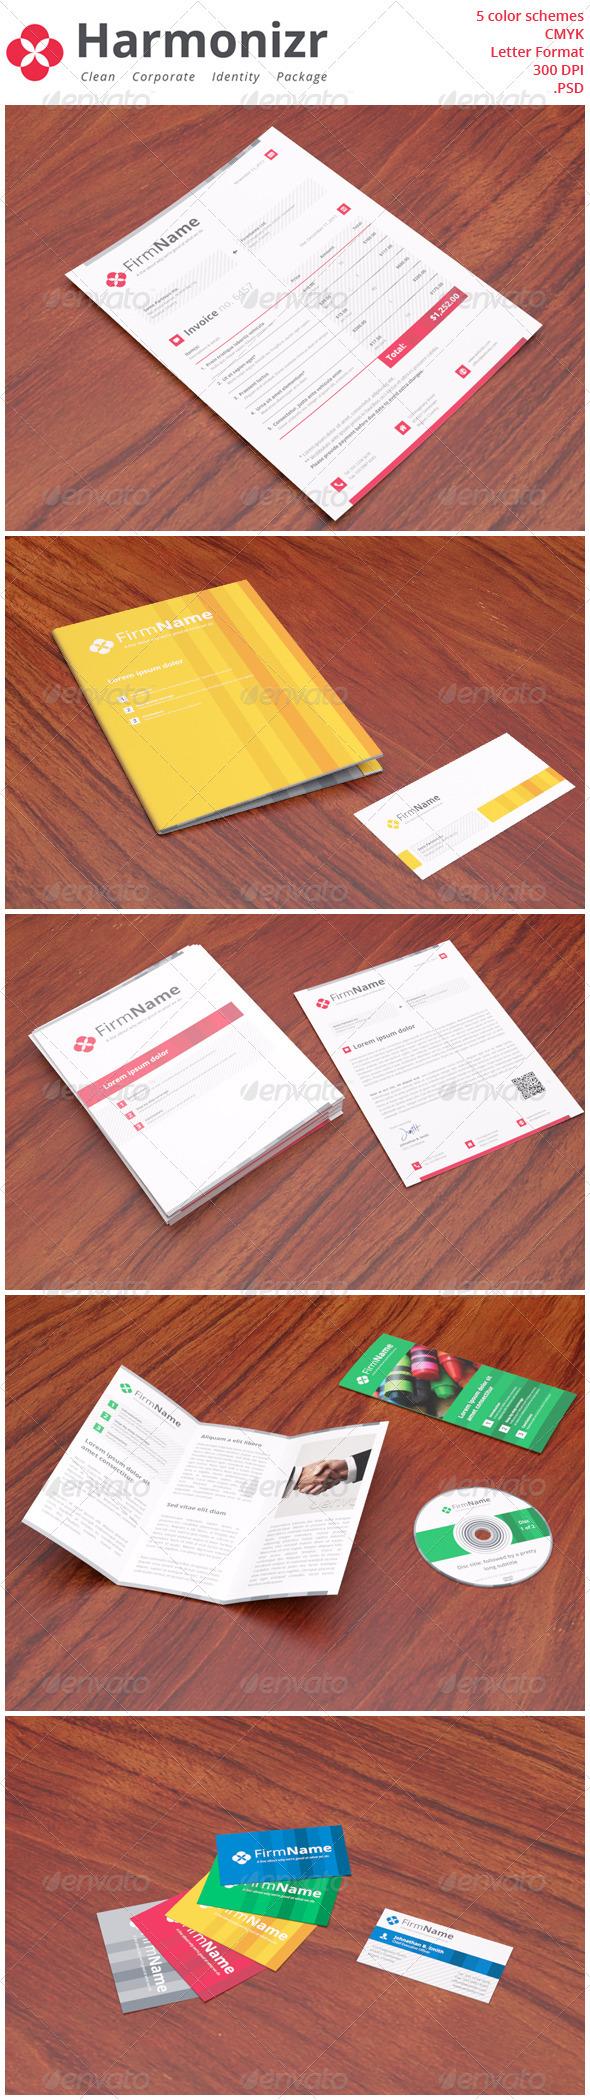 Harmonizr Clean Corporate Identity Package Corporate